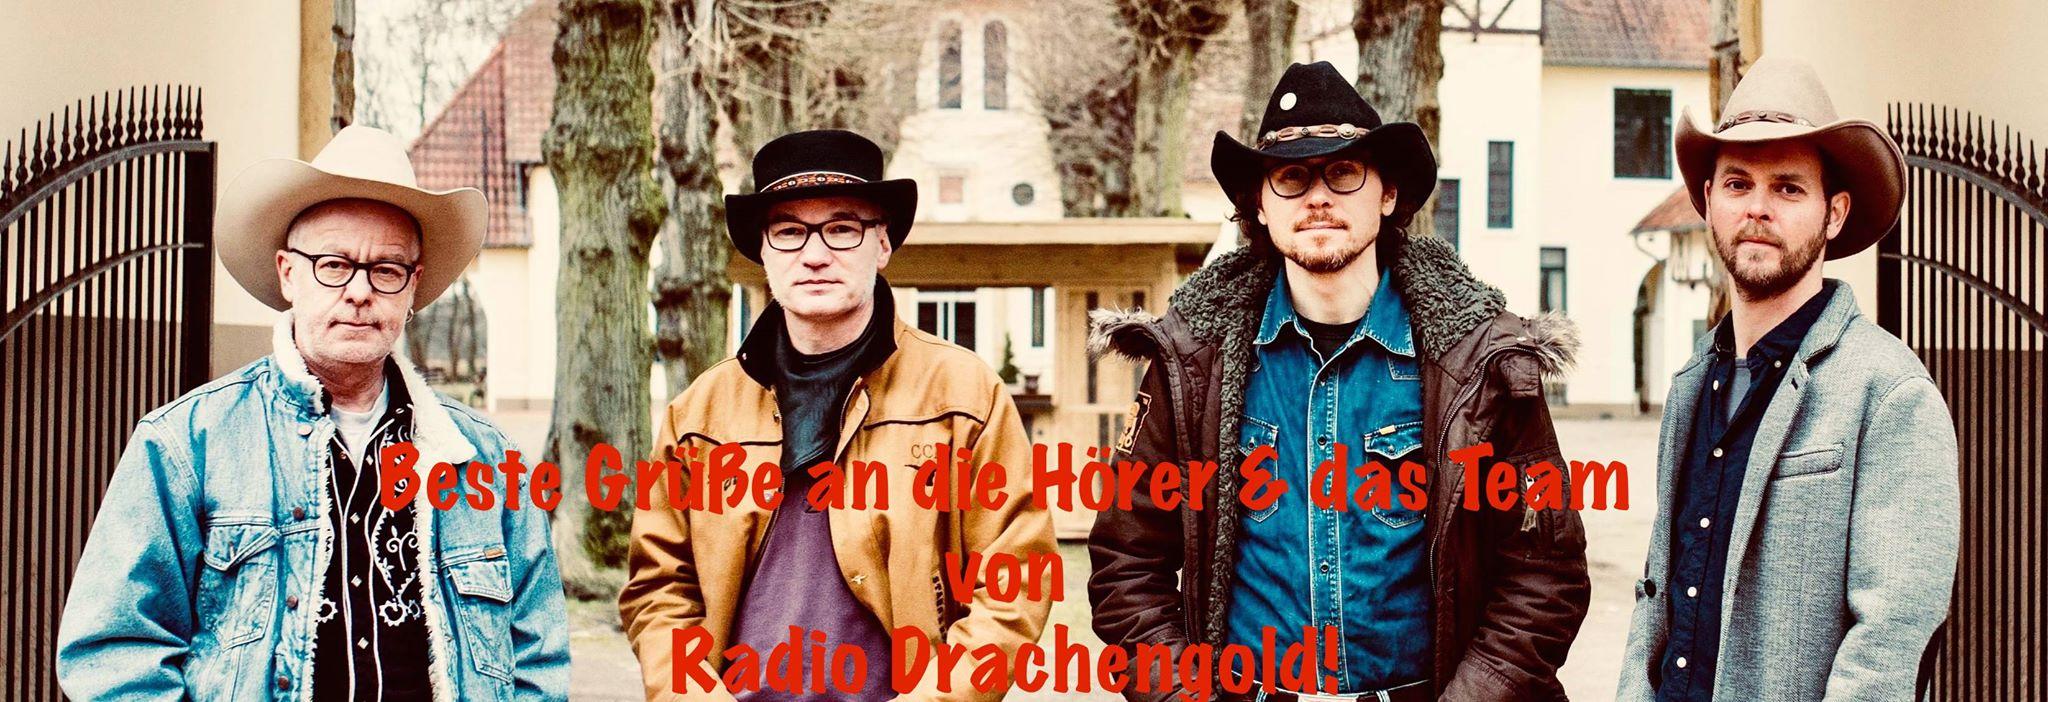 http://radio-drachengold.de/Autogramme/BallermannCountryBand%20(2).jpg